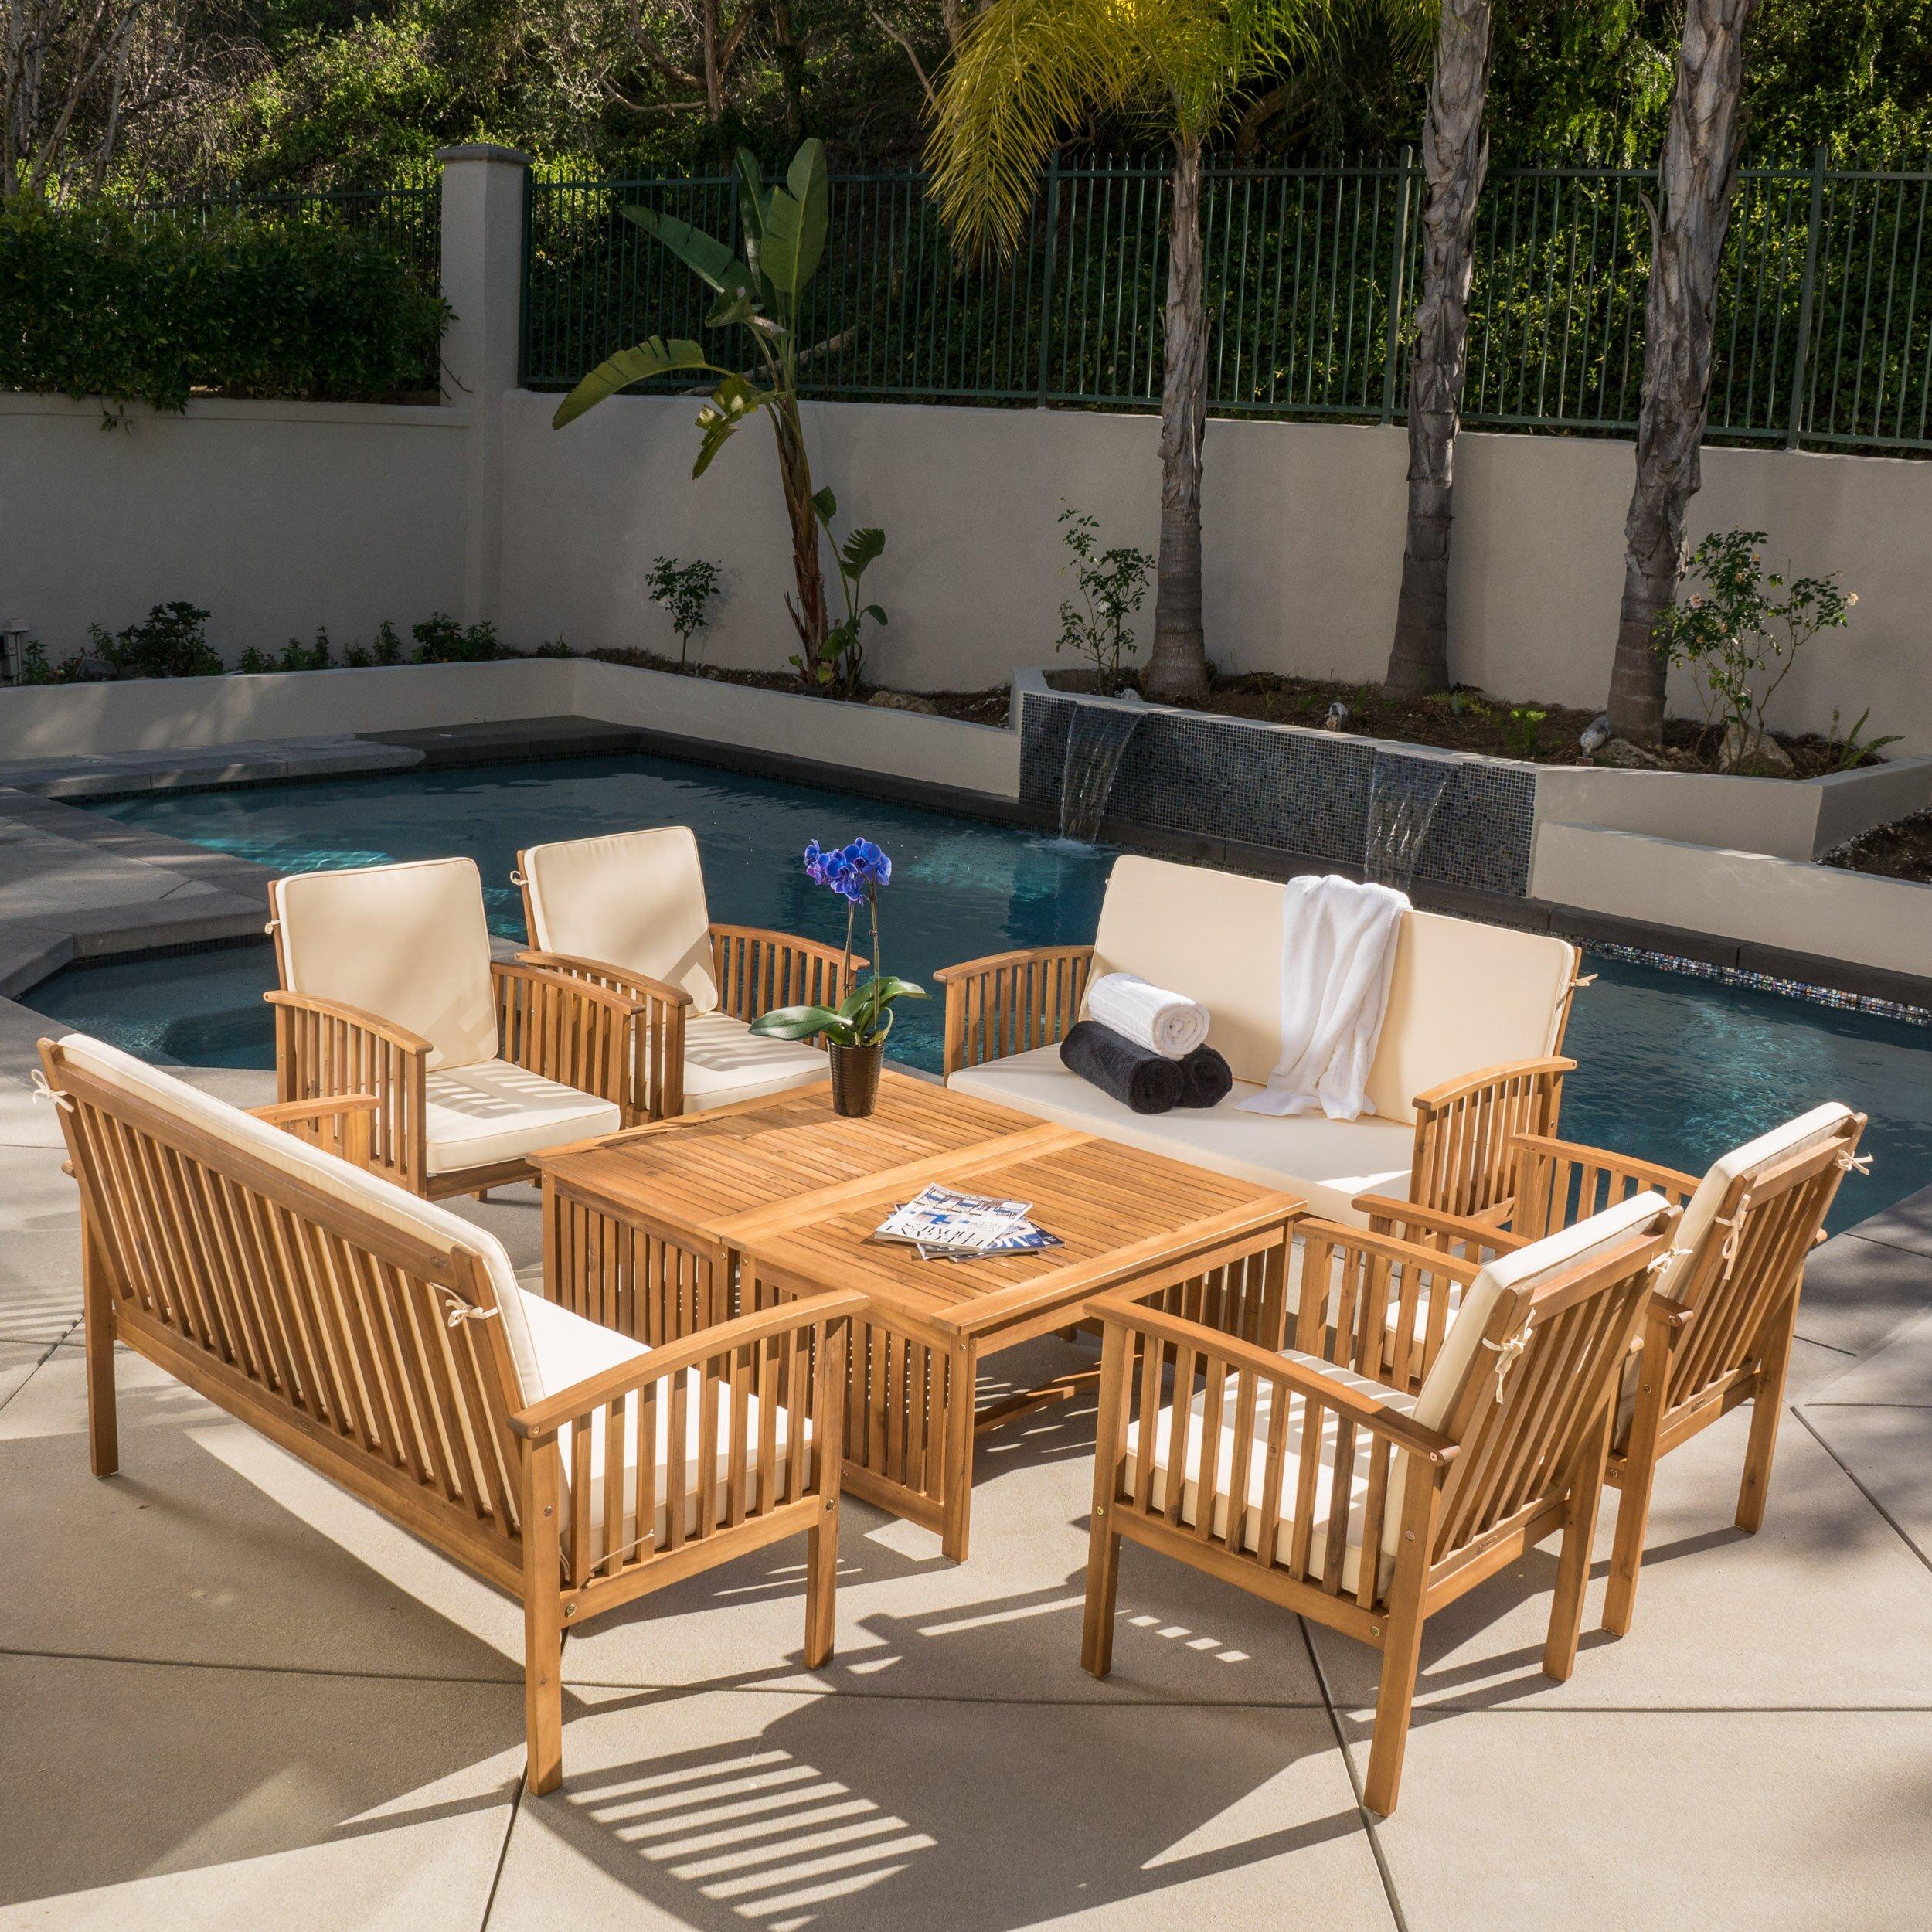 home loft concepts dakota 8 piece dining set with cushion reviews wayfair. Black Bedroom Furniture Sets. Home Design Ideas